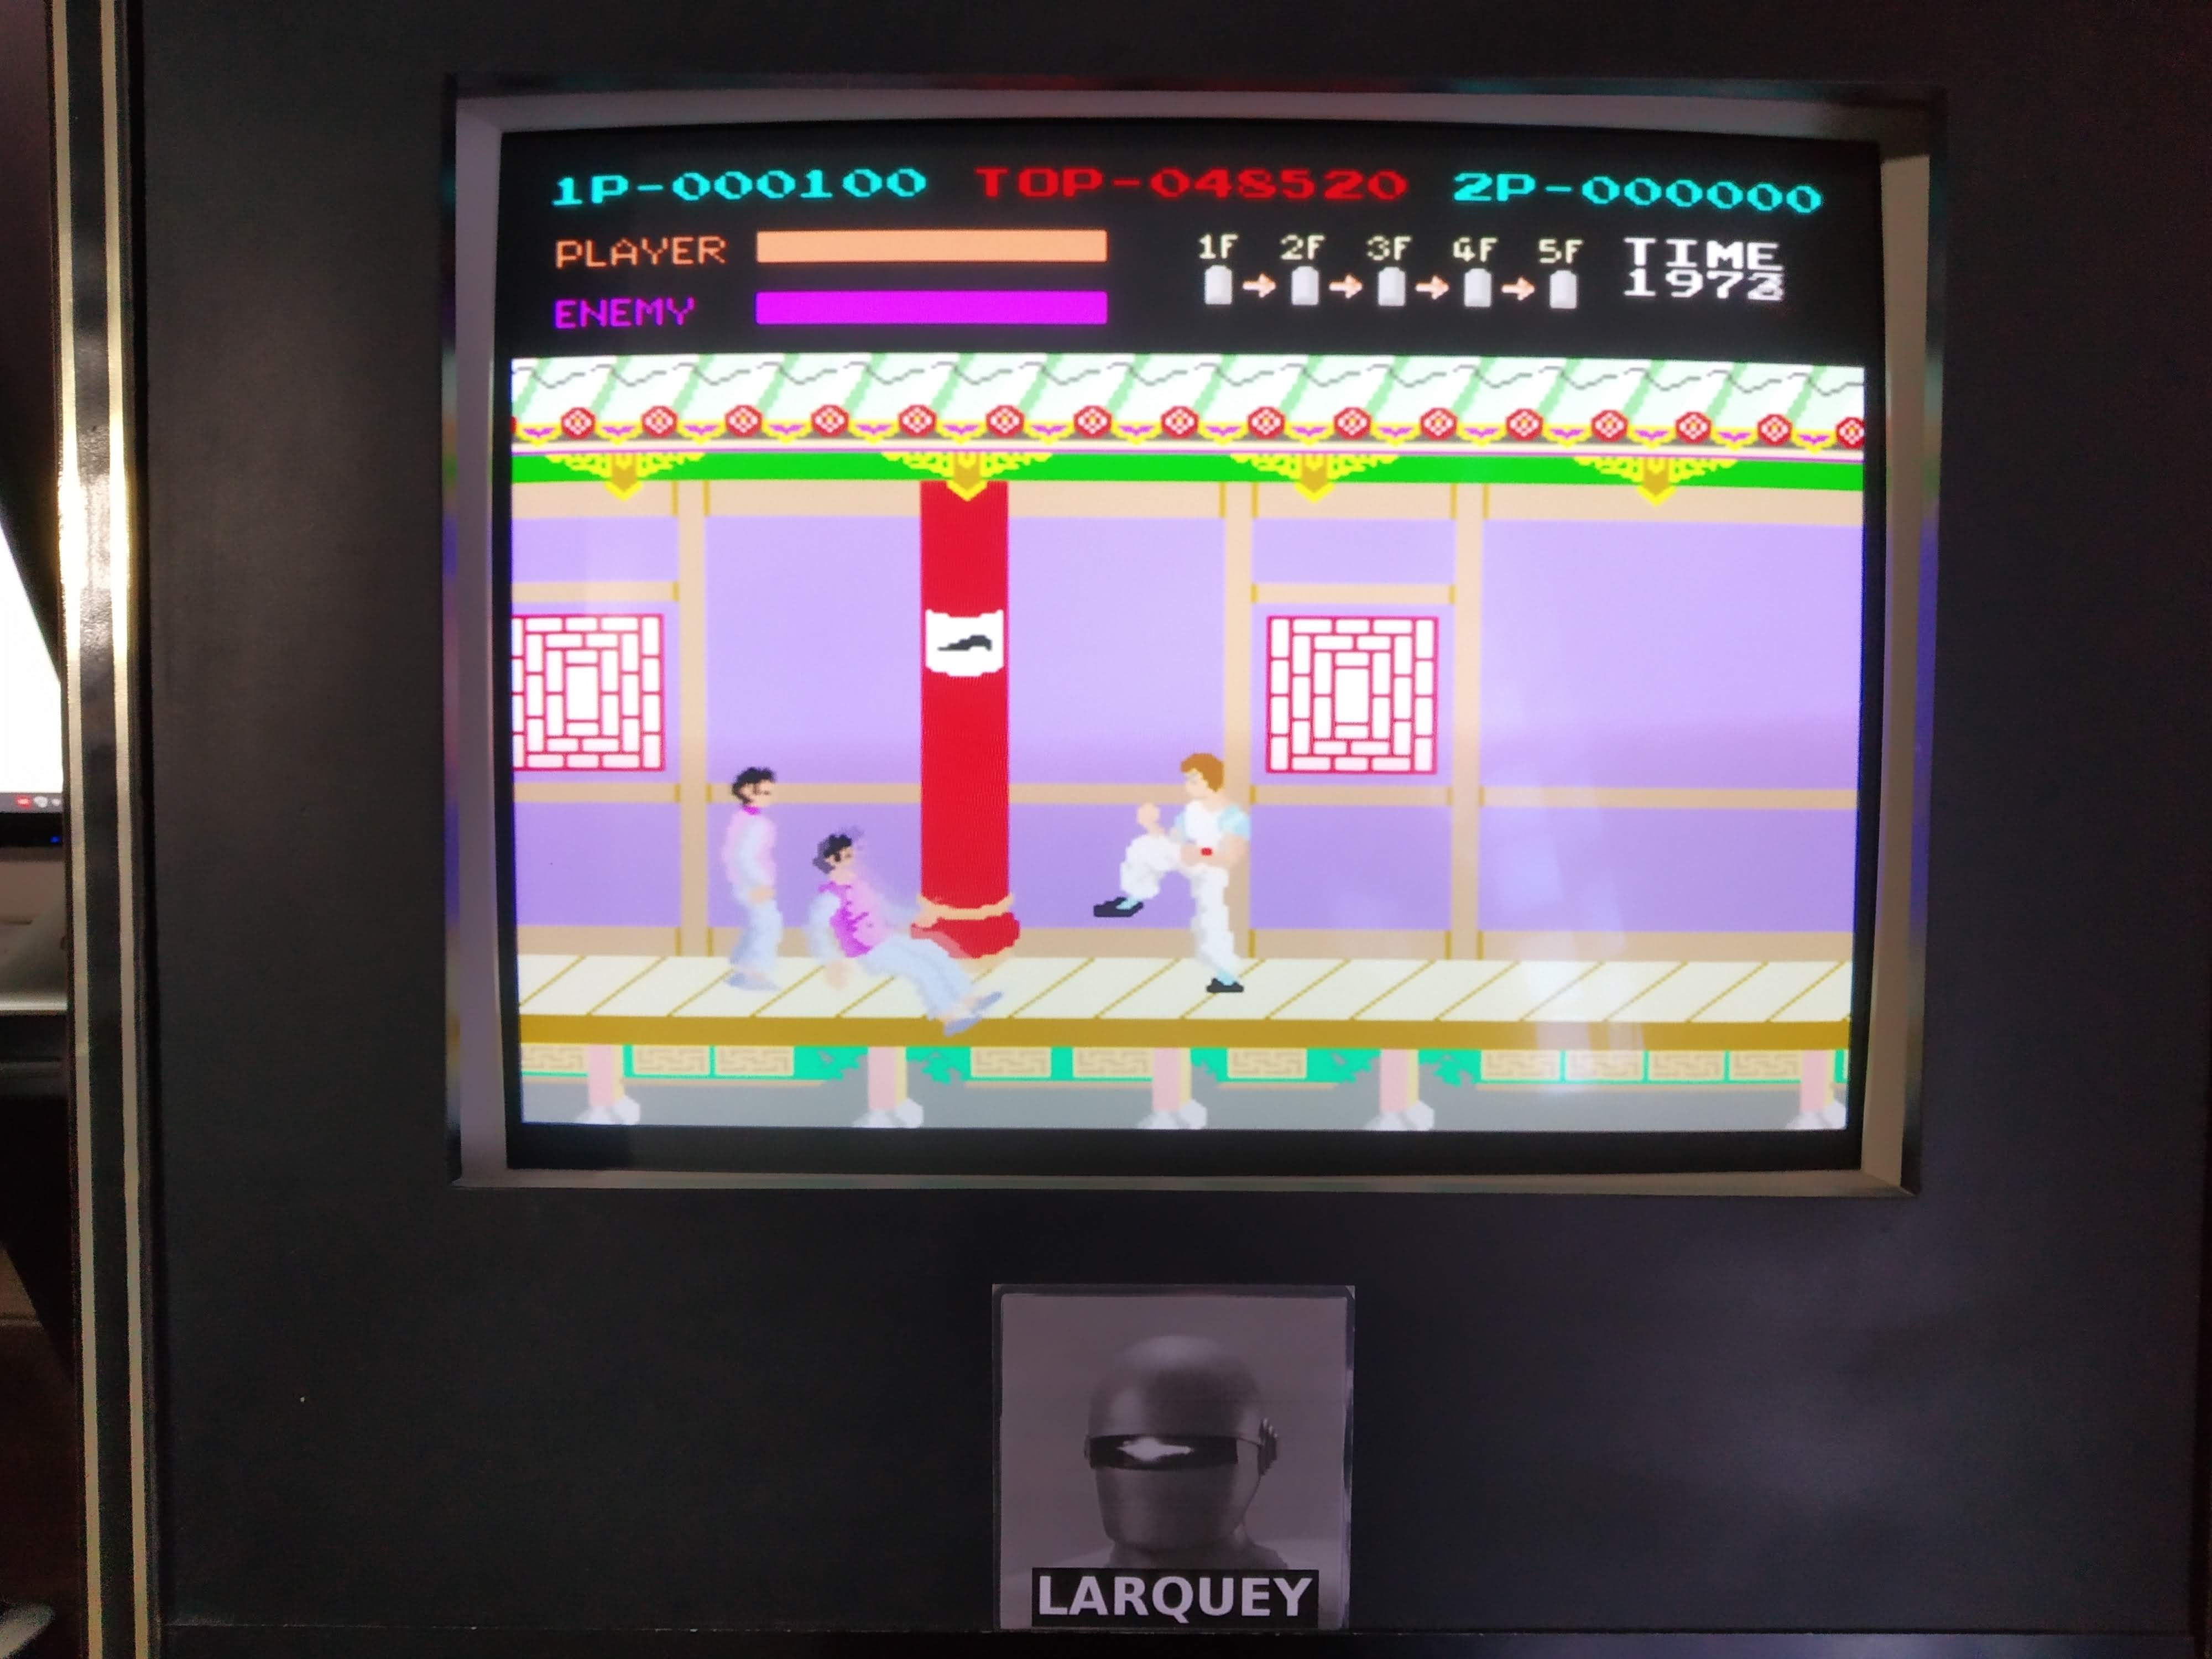 Larquey: Kung Fu Master (Arcade Emulated / M.A.M.E.) 20,700 points on 2019-09-08 12:46:17